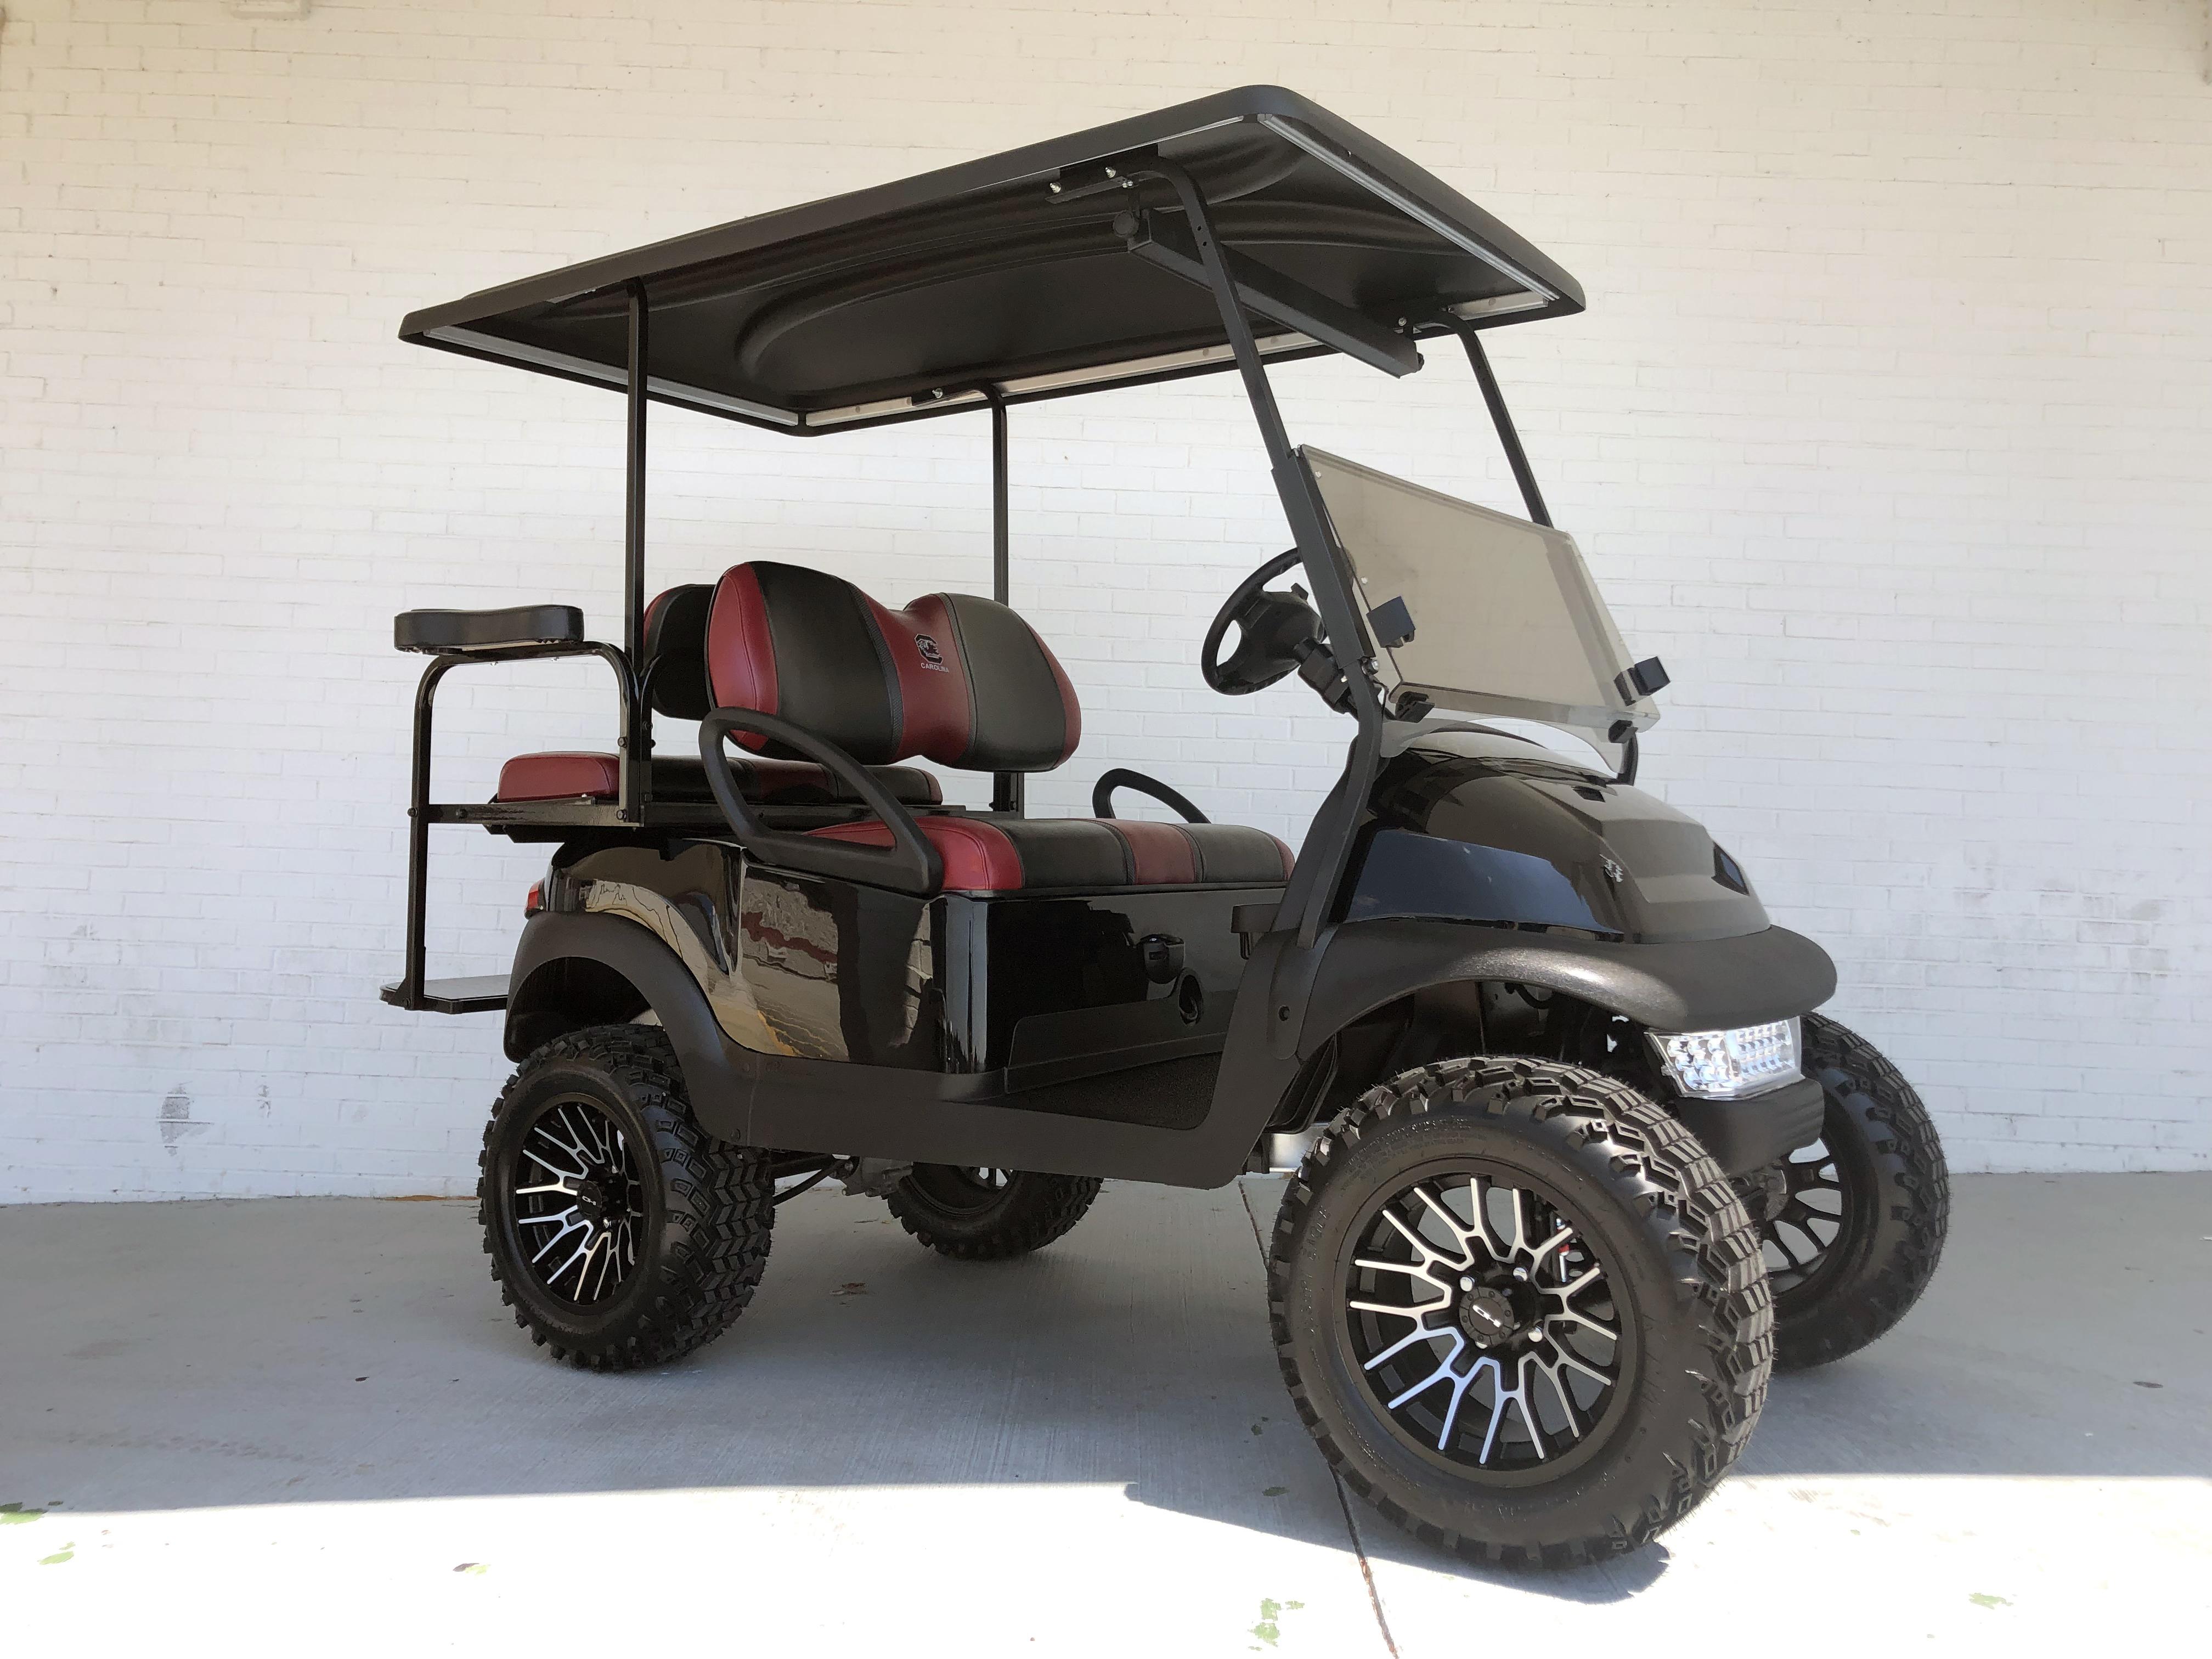 Gamecock Black Burgundy Lifted Club Car Golf Cart Golf Carts Lifted